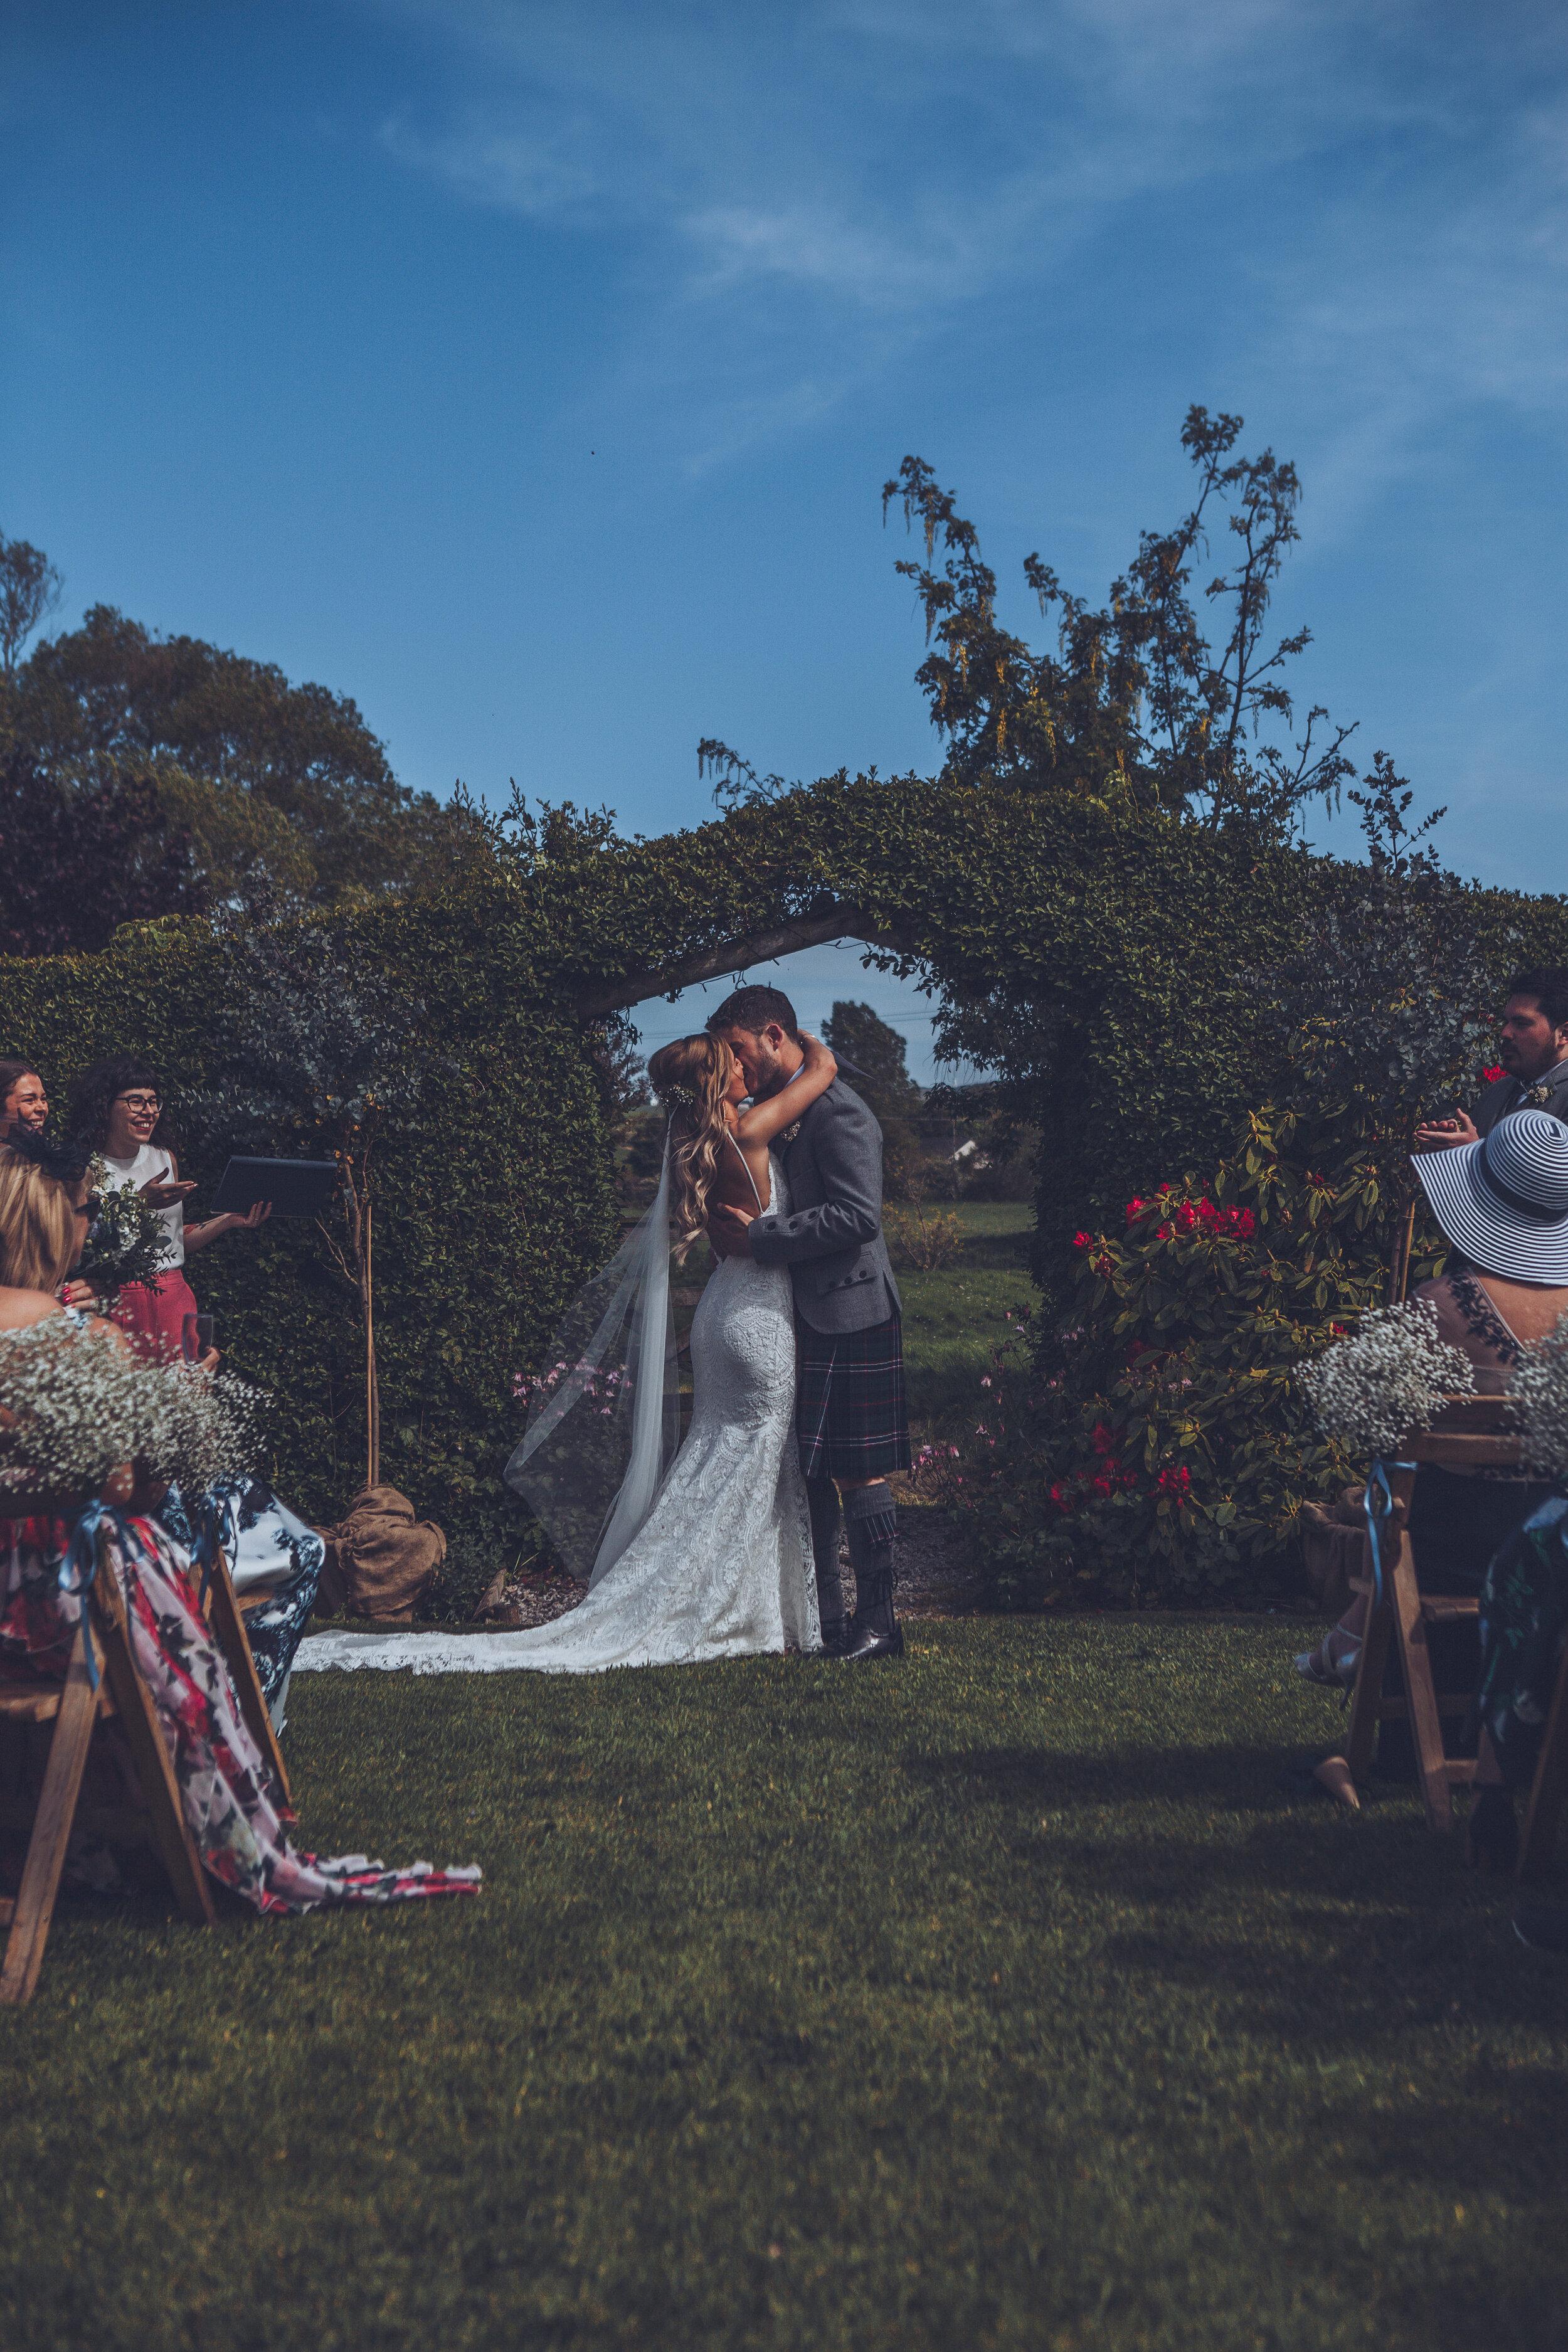 Dalduff Farm Ayrshire Wedding Photography - Claire Basiuk Photographer - 08.jpg